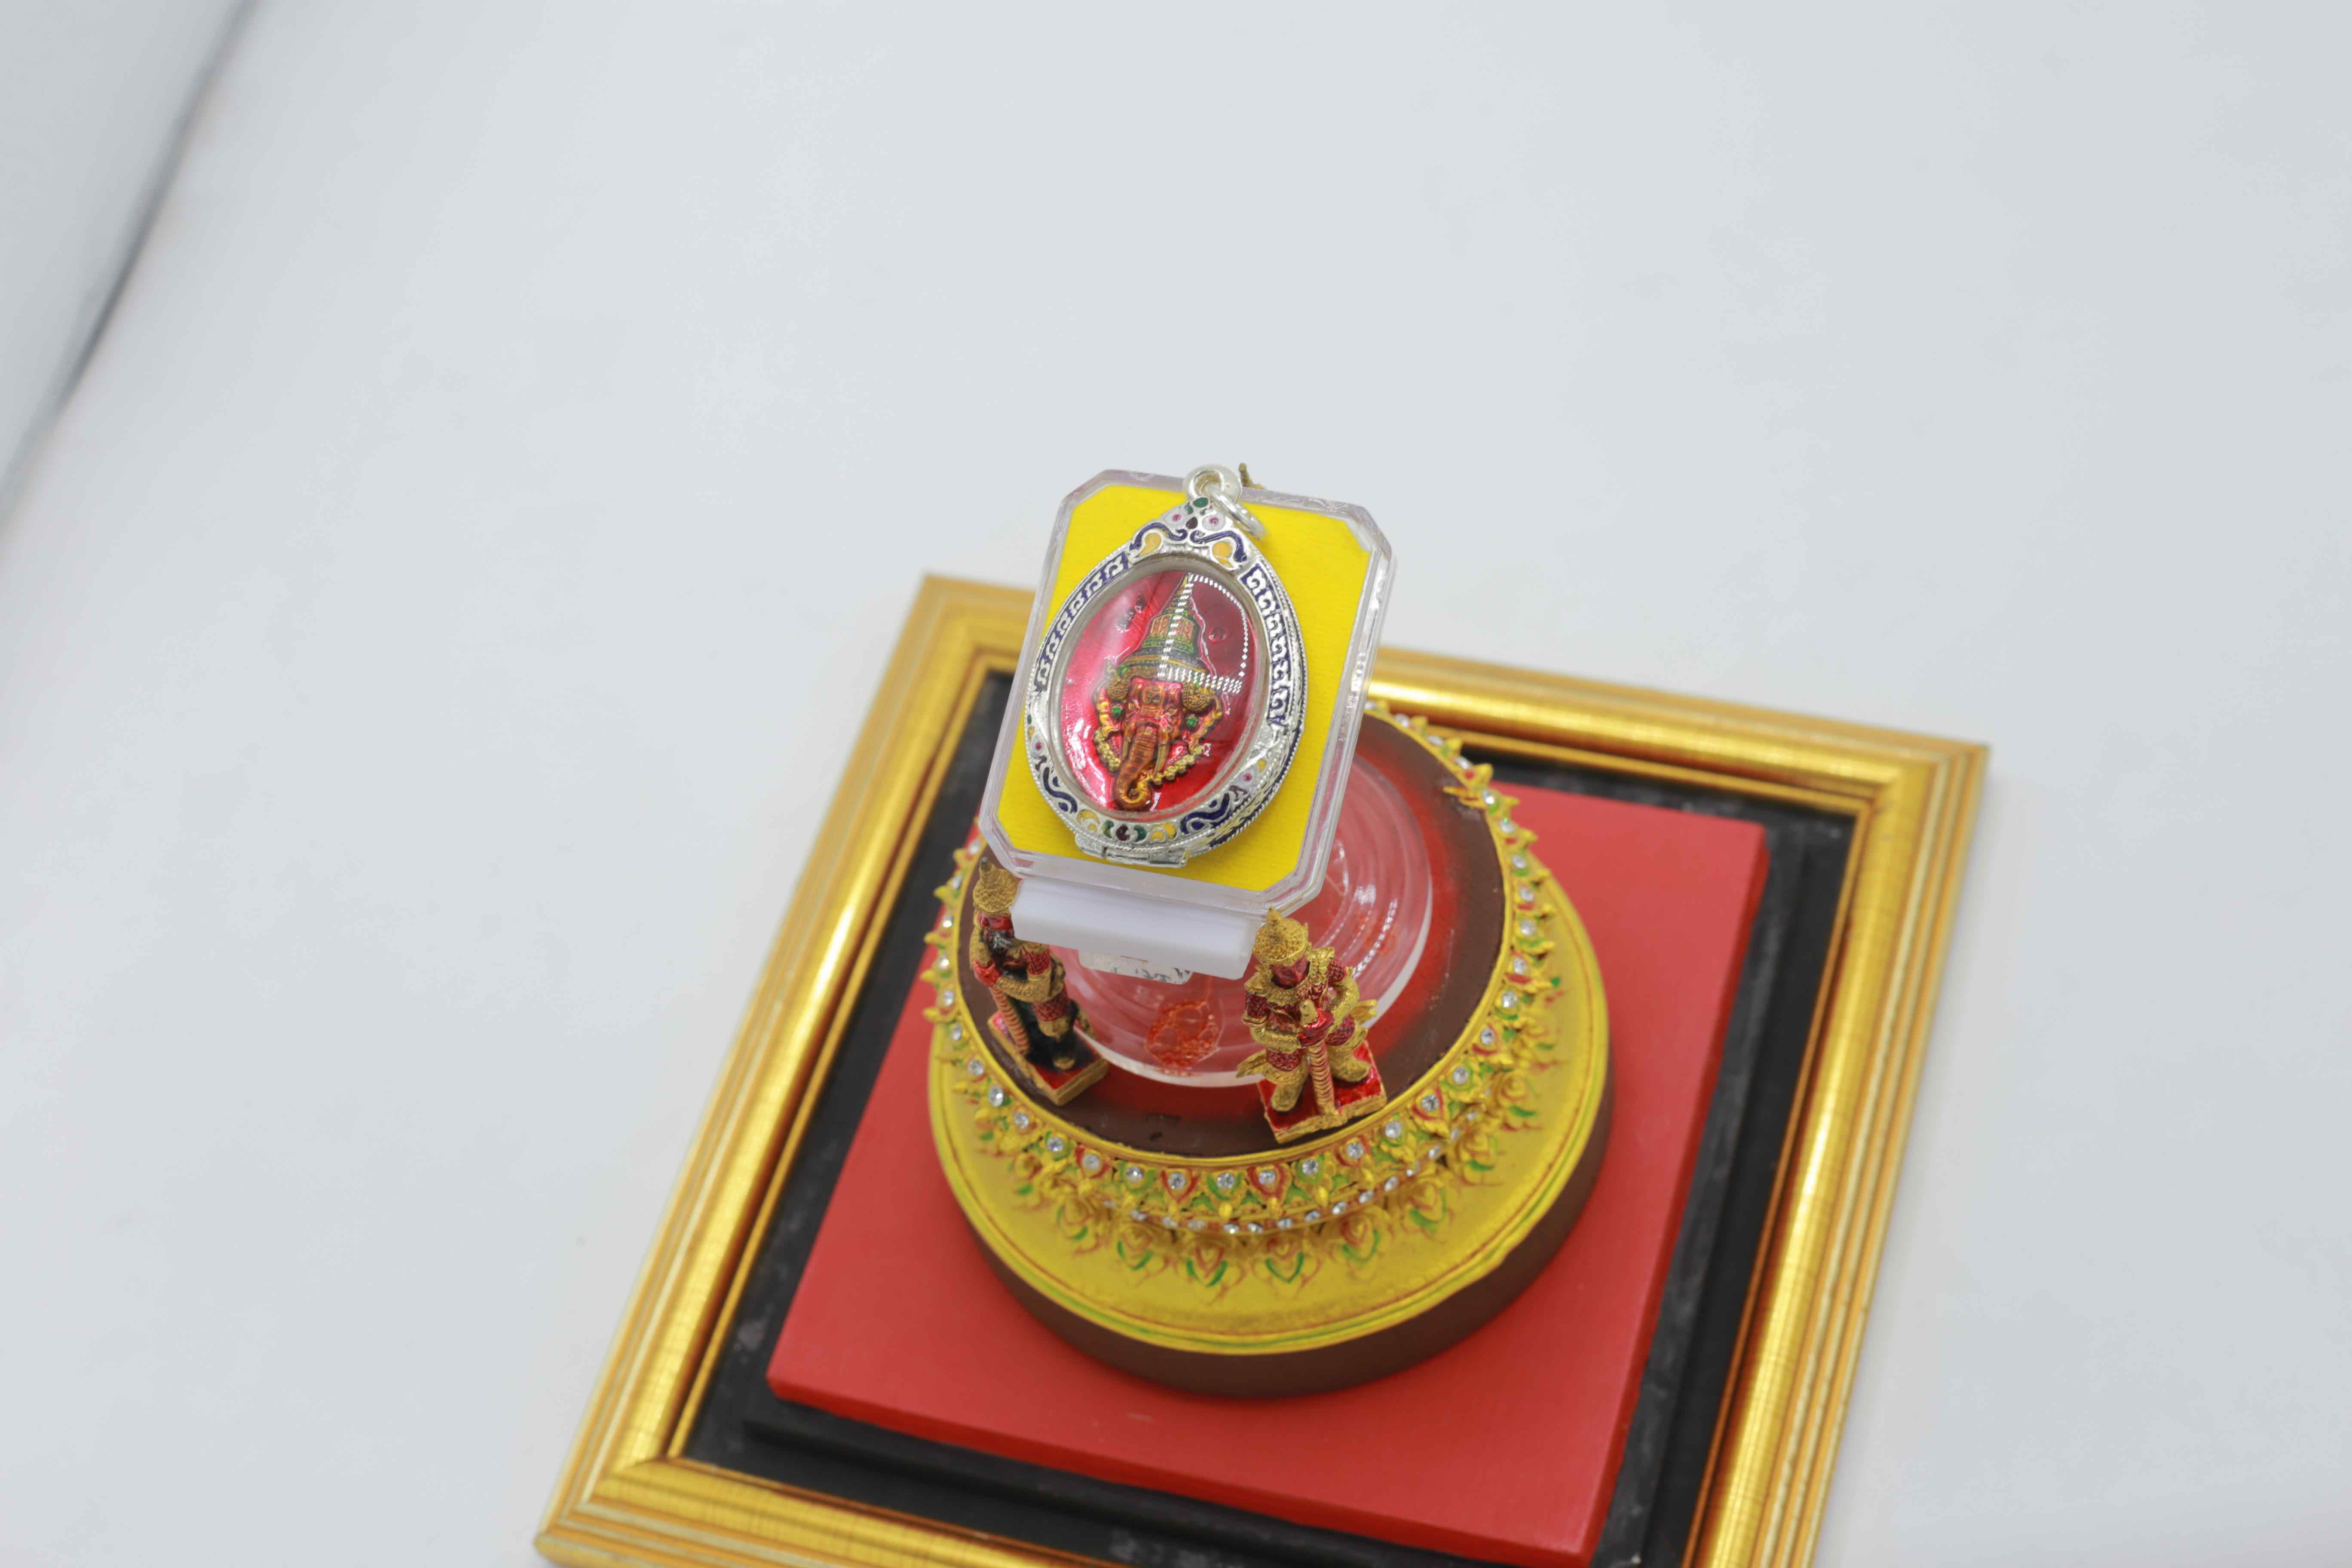 D00061 ผลงานศิลป์ การลงรักปิดทอง ลงยาราชาวดี เพนท์สีวัตถุมงคลเครื่องรางไทย